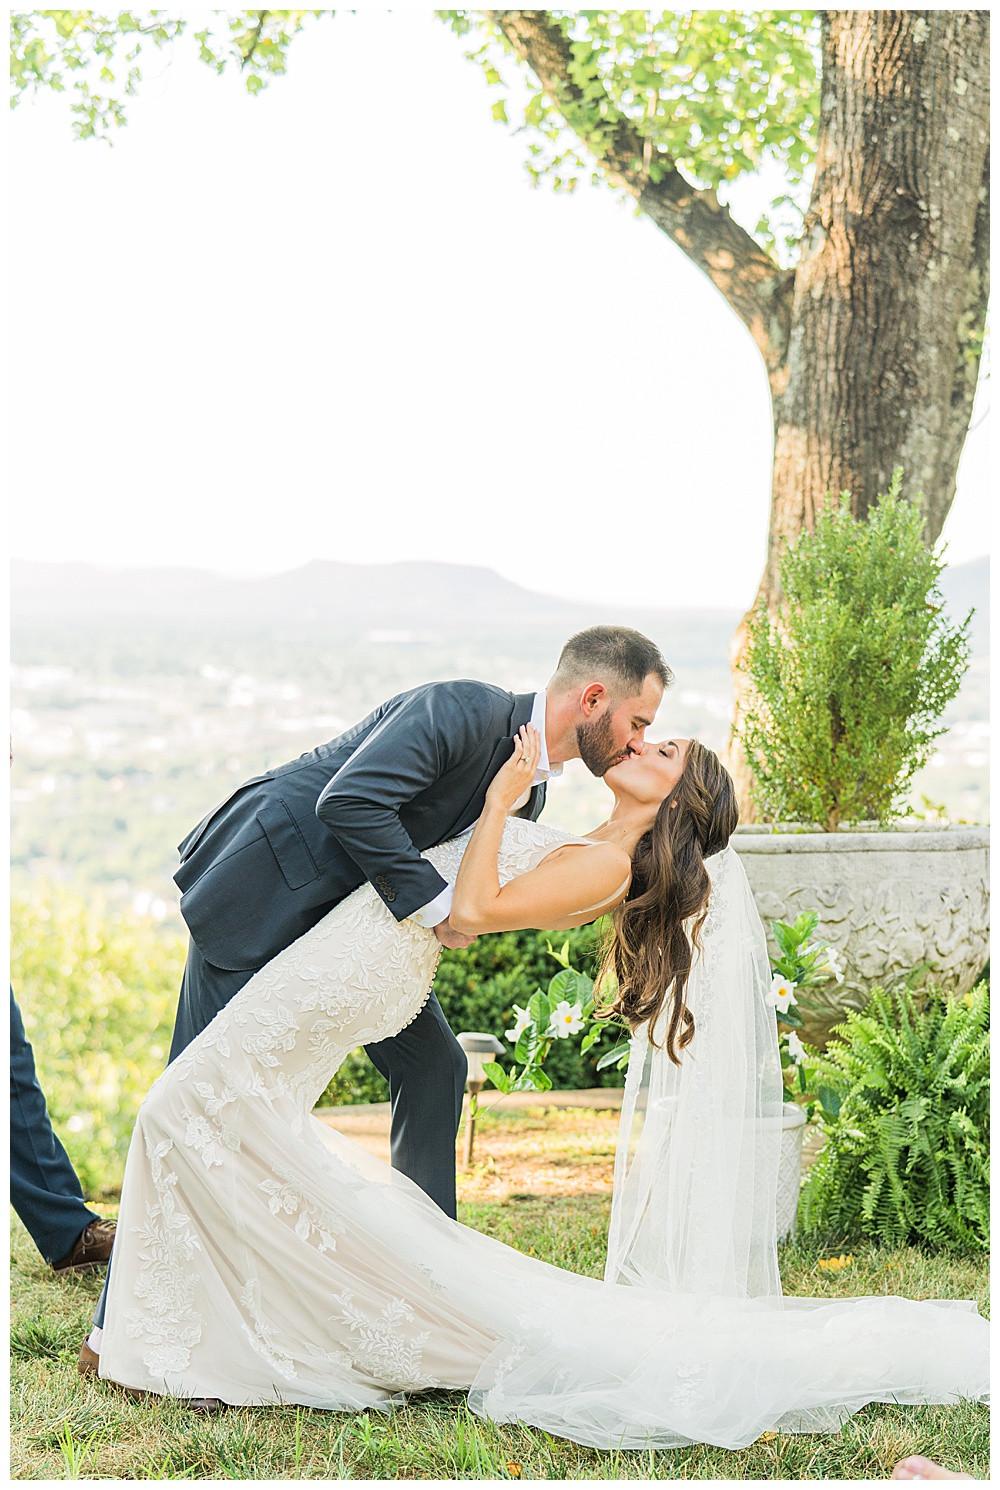 Roanoke Virginia Wedding, 2020 wedding photographer, best of  2020 weddings, elopement, Austin & Austin Photography, Rockledge Mansion